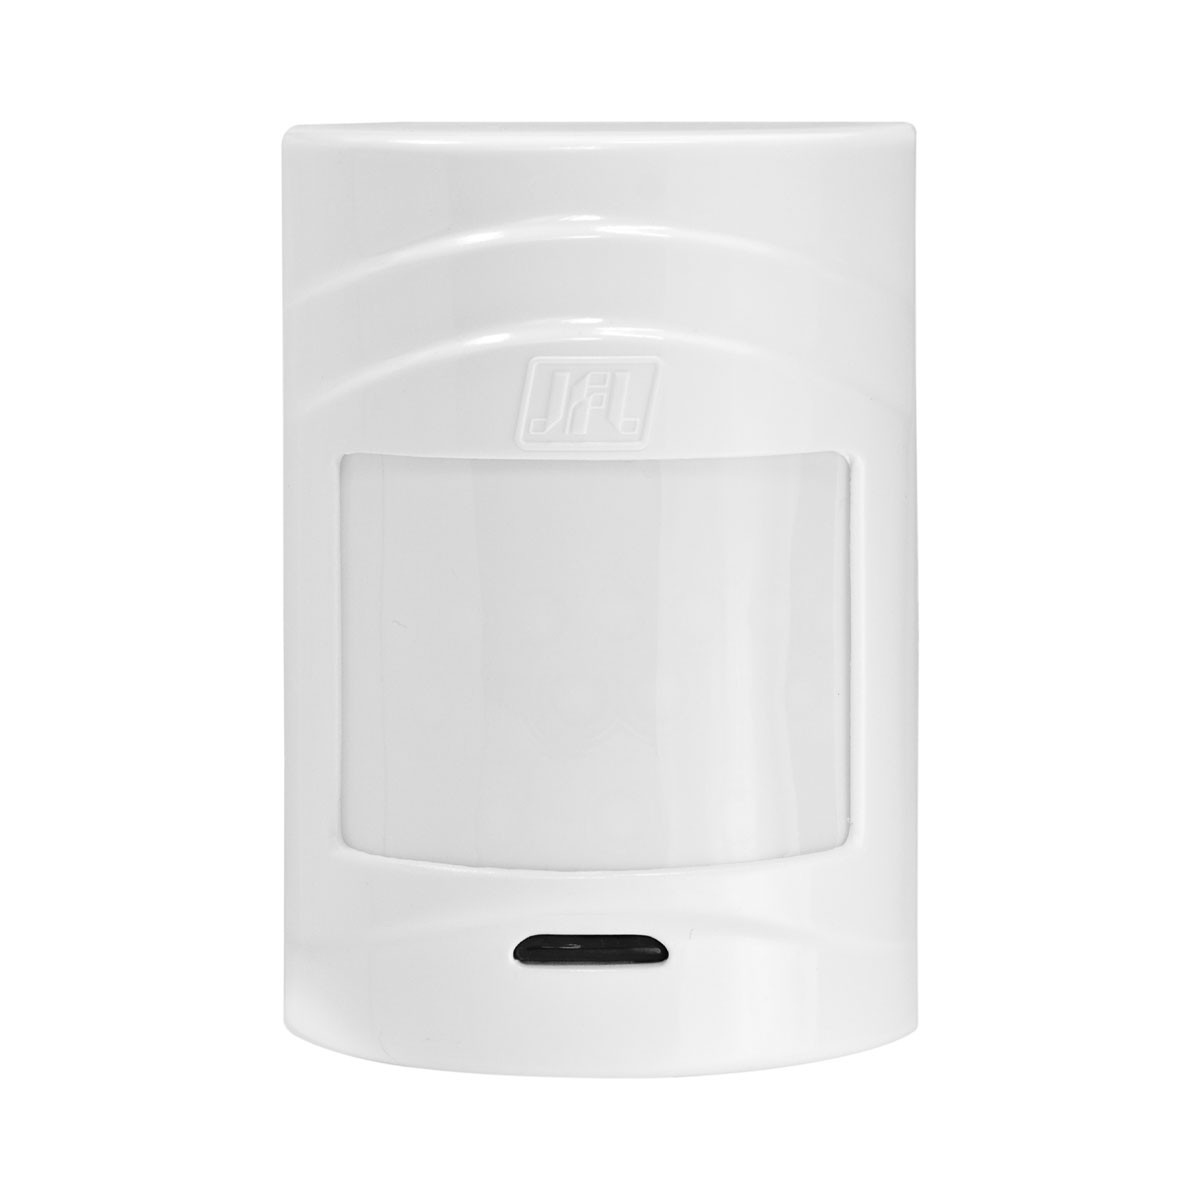 Kit Alarme Gsm Brisa Cell 804 Jfl Sensores Sem Fio IrPet 530Sf